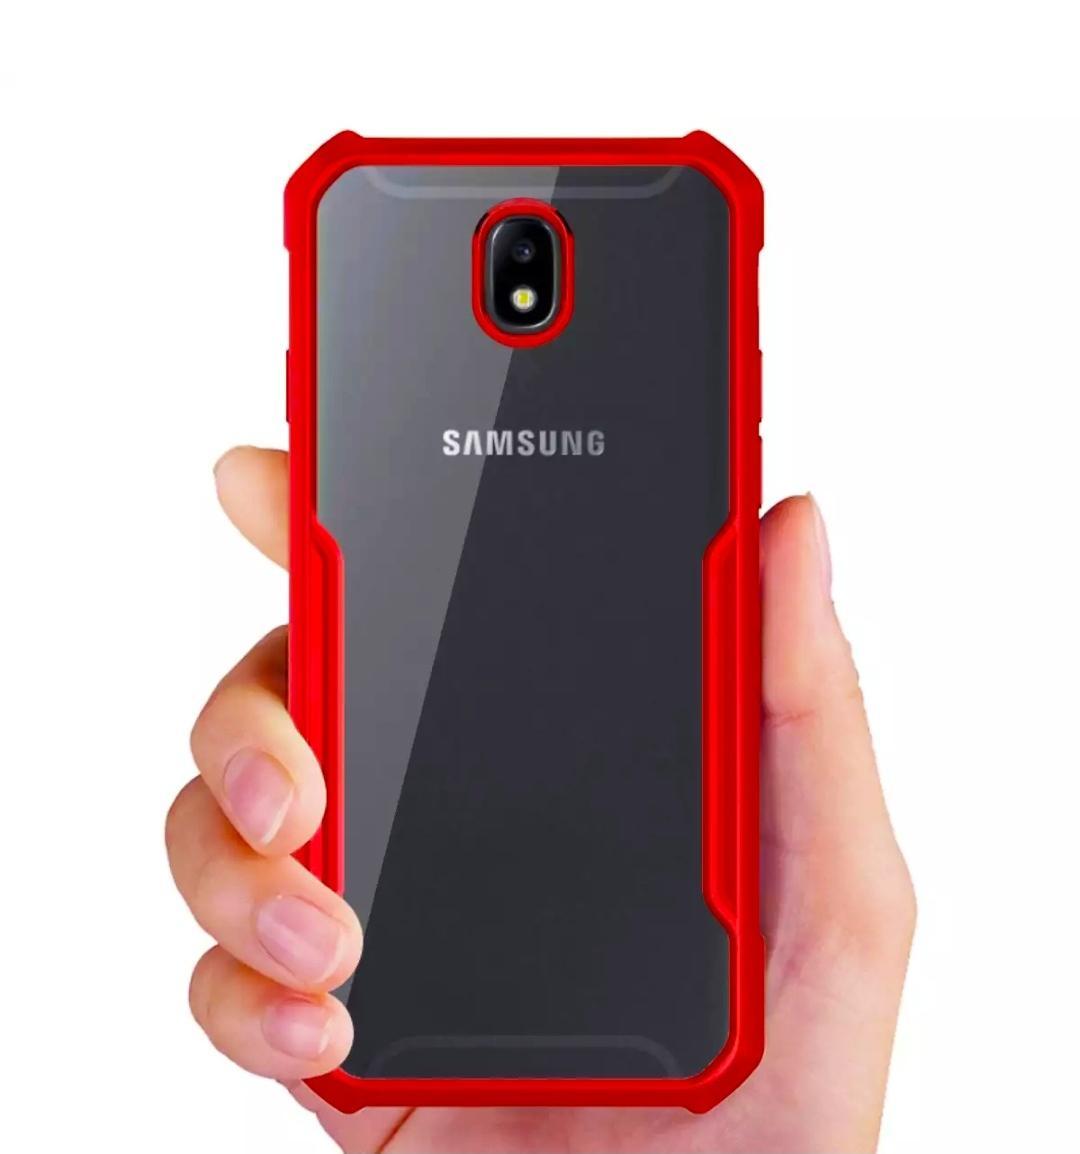 Xundd Philippines Price List Phone Cases For Sale Lazada Slim Case Matte Black Babyskin Xiaomi Redmi 5 Plus 5plus New Hot Type Samsung J7 Pro Beatle Series